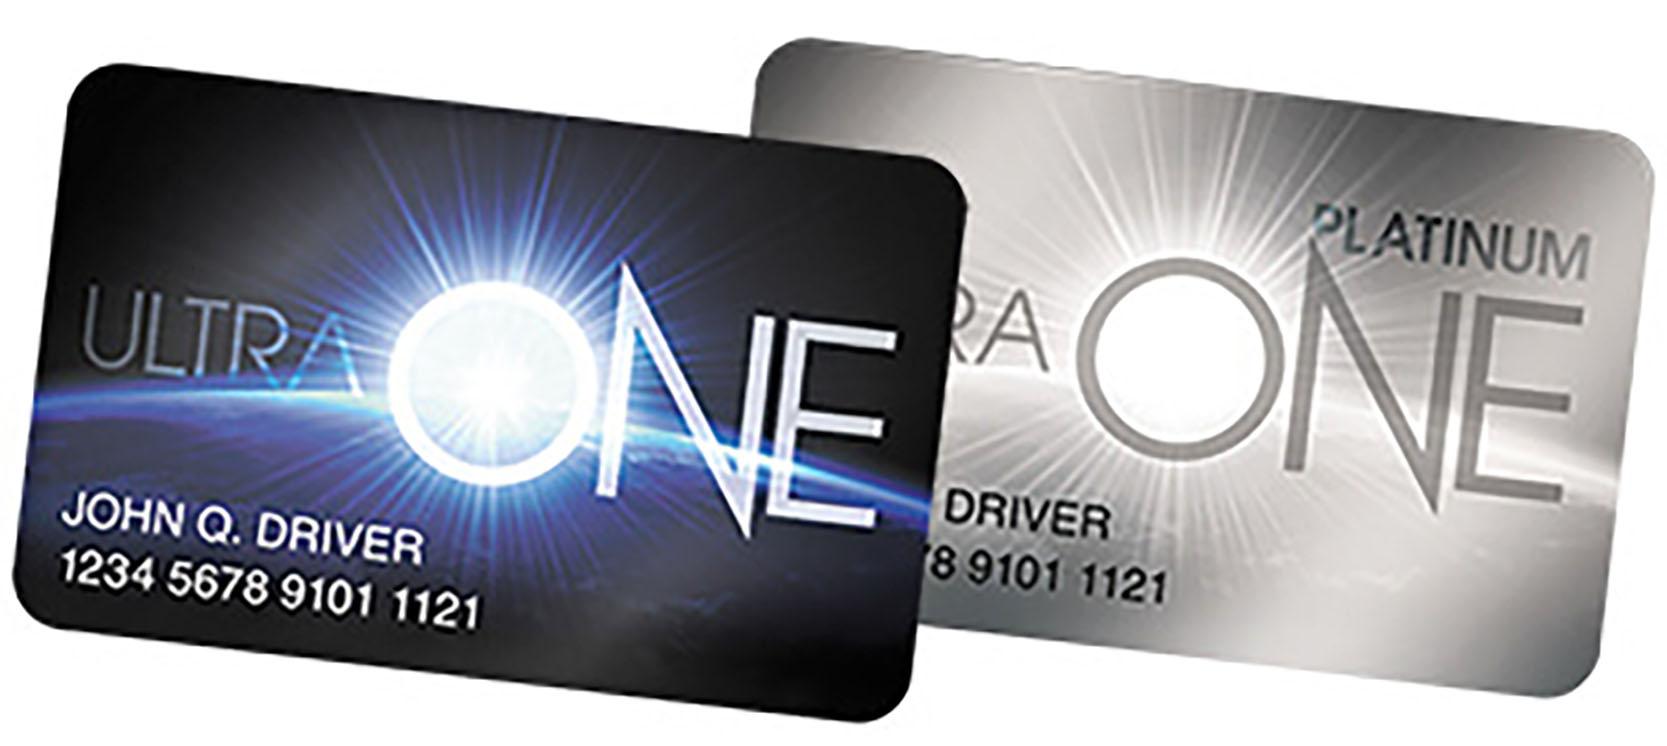 UltraONE Loyalty Card